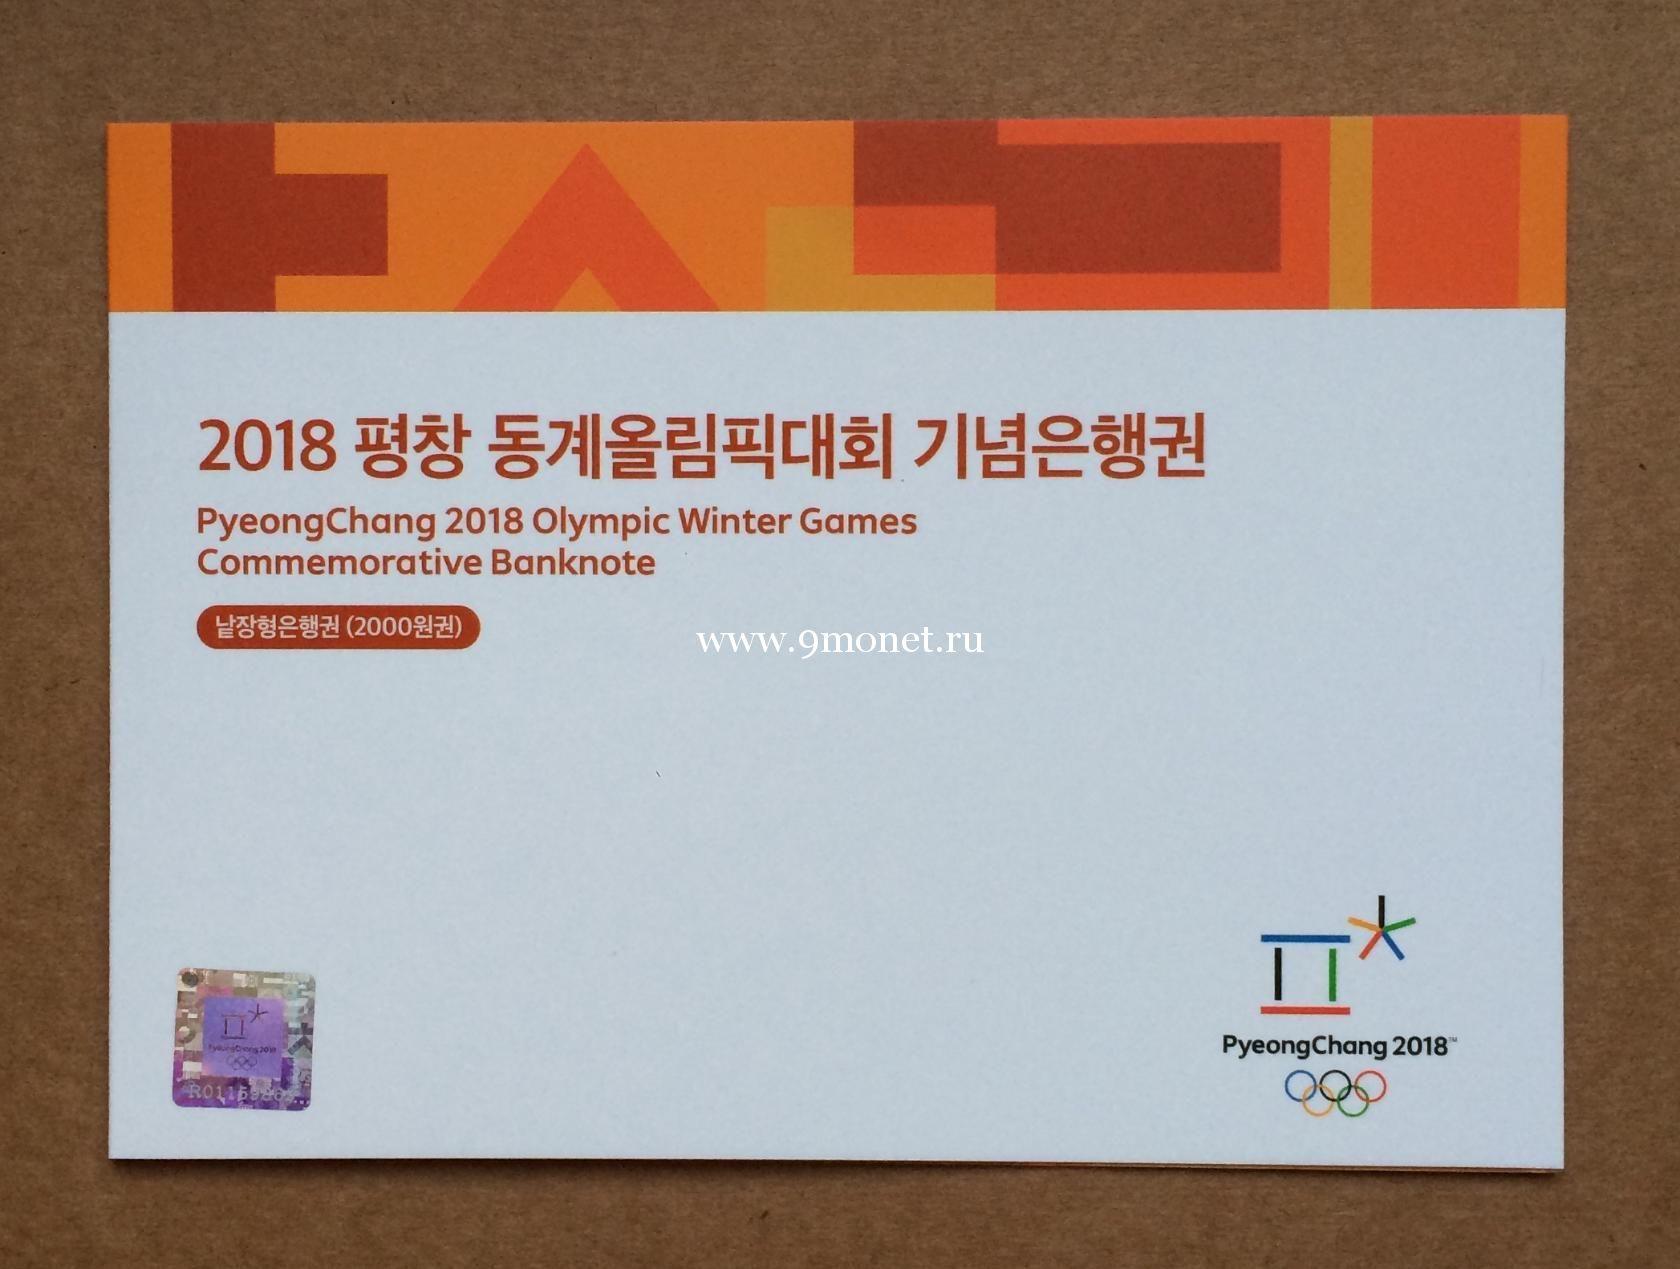 Корея 2000 вон 2017 года Олимпиада в Пхечане 2018